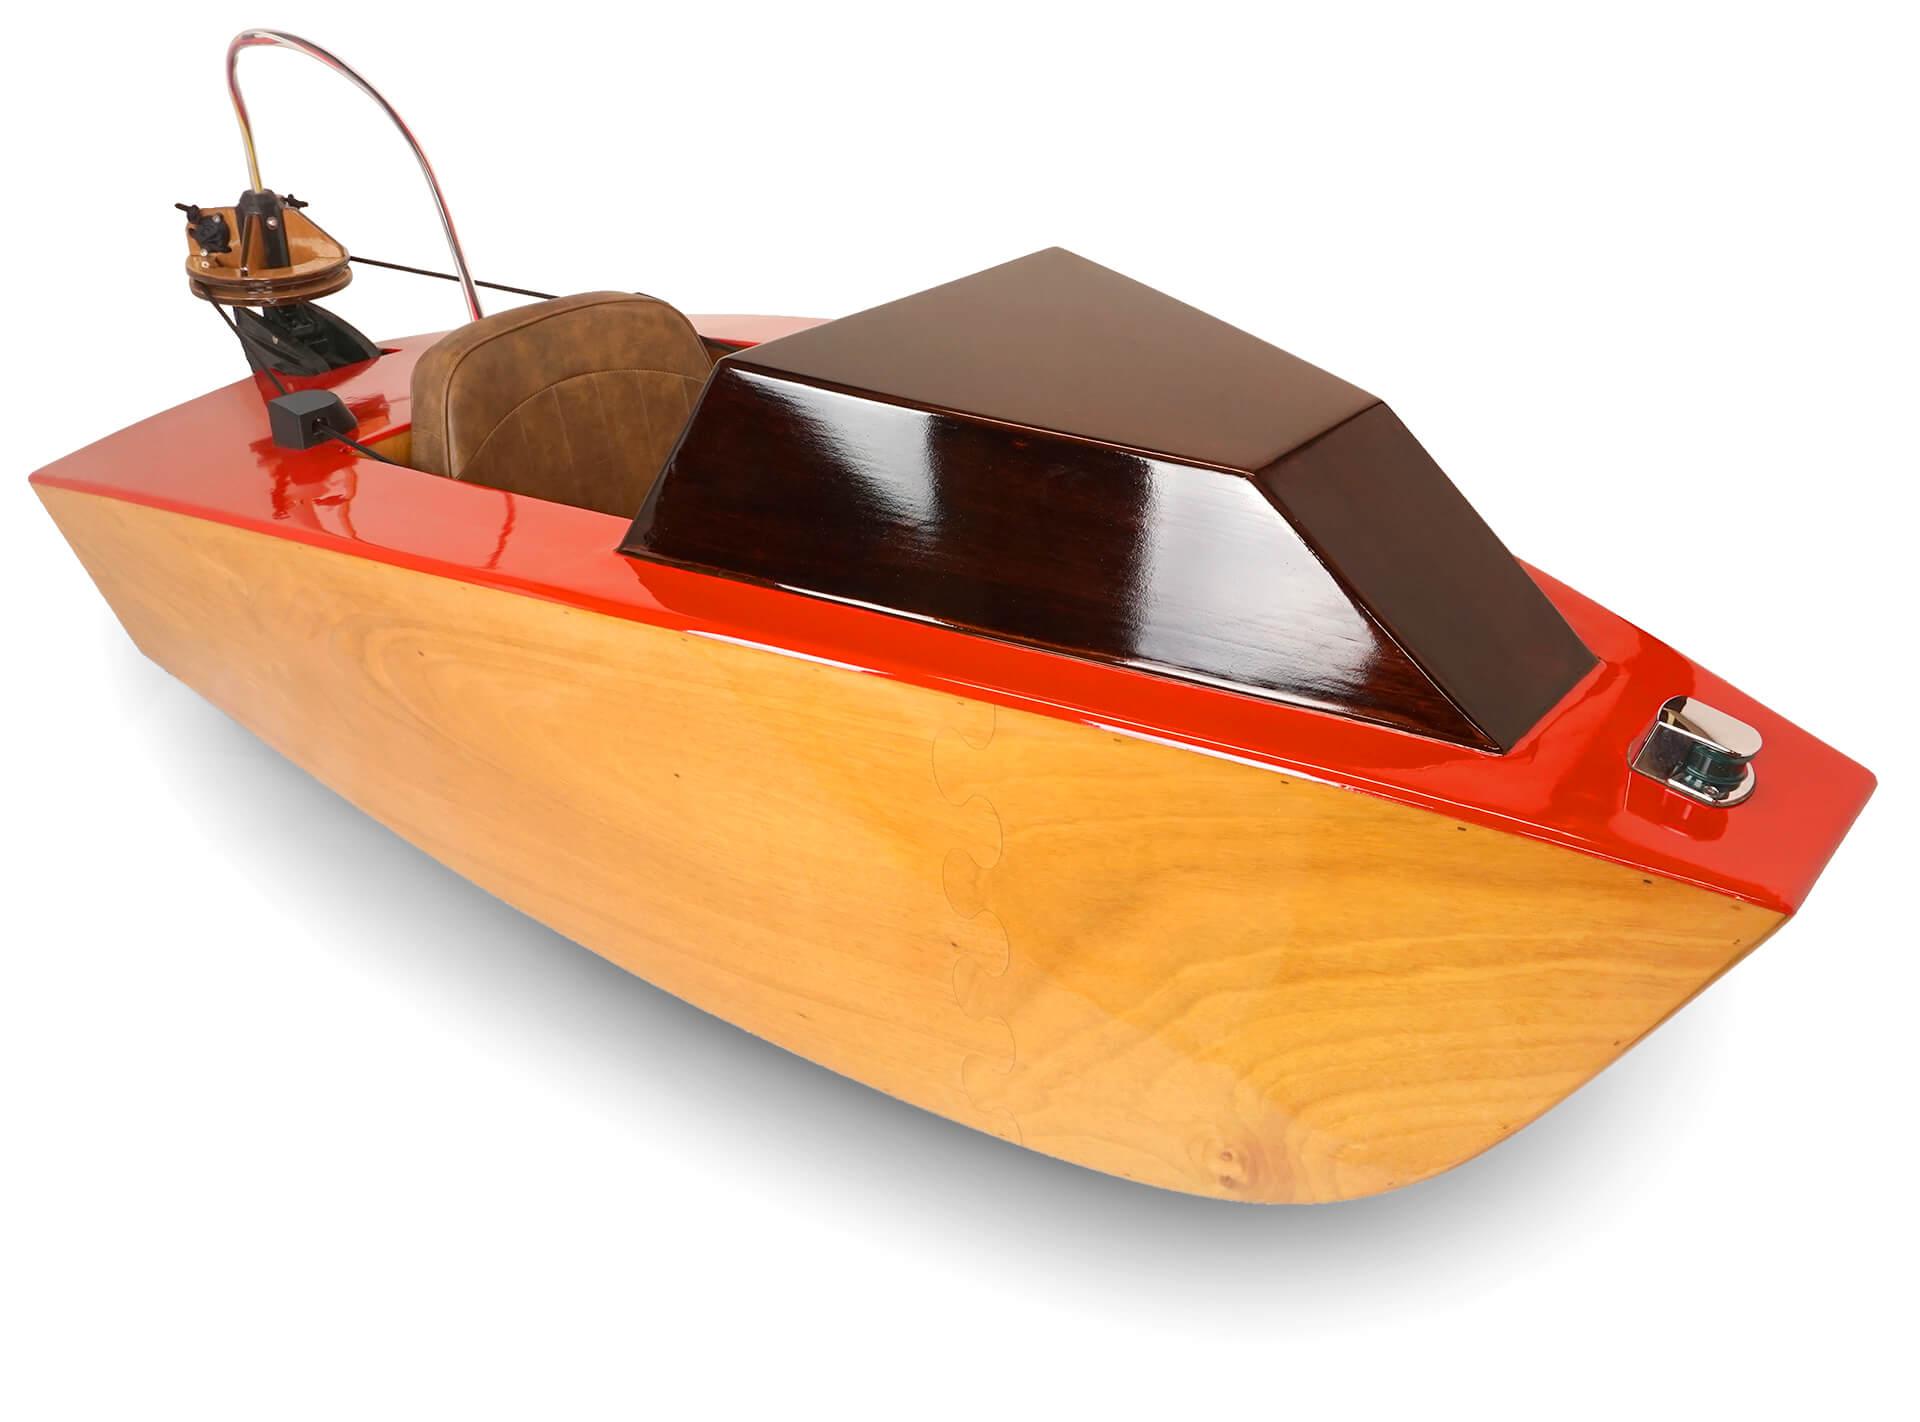 Google Home Mini Power Cable >> Mini Boat - A mini but full-sized electric boat